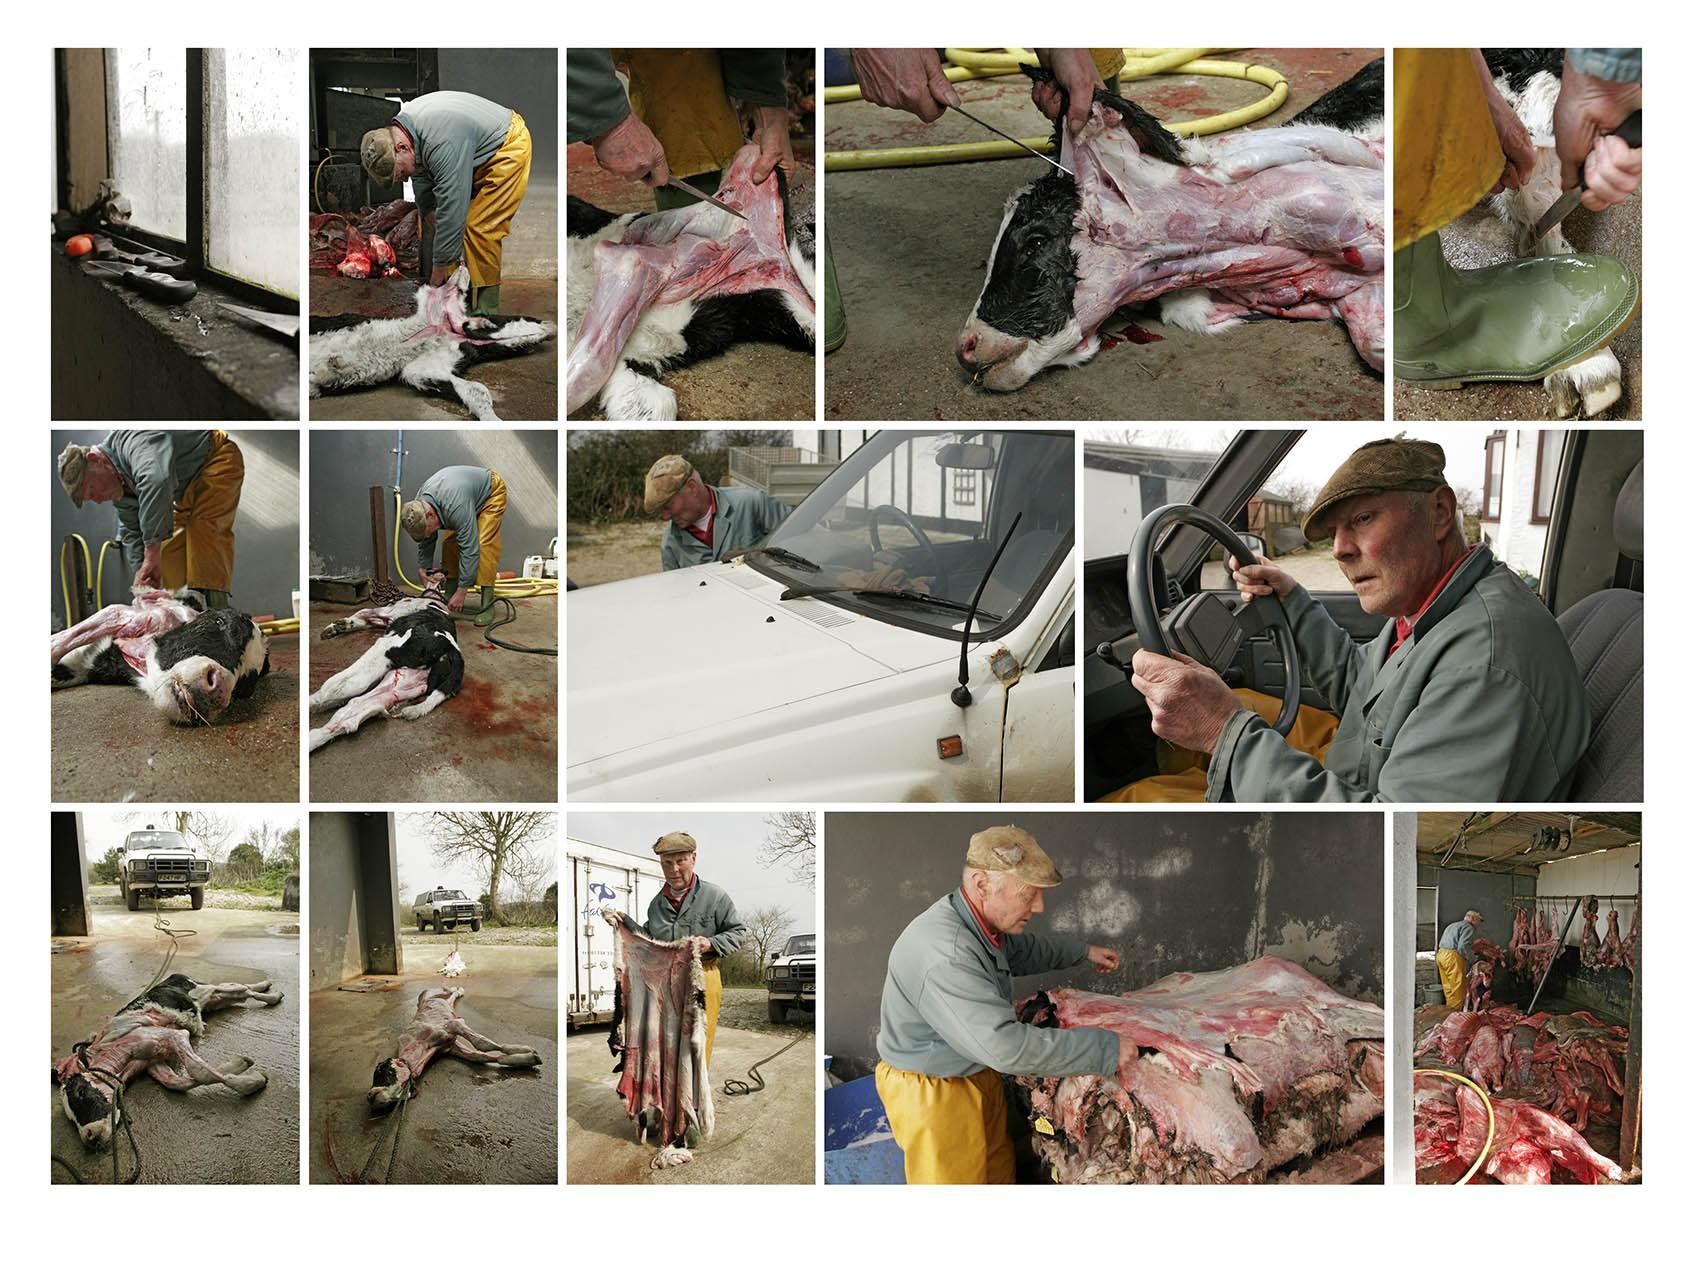 cow skinning